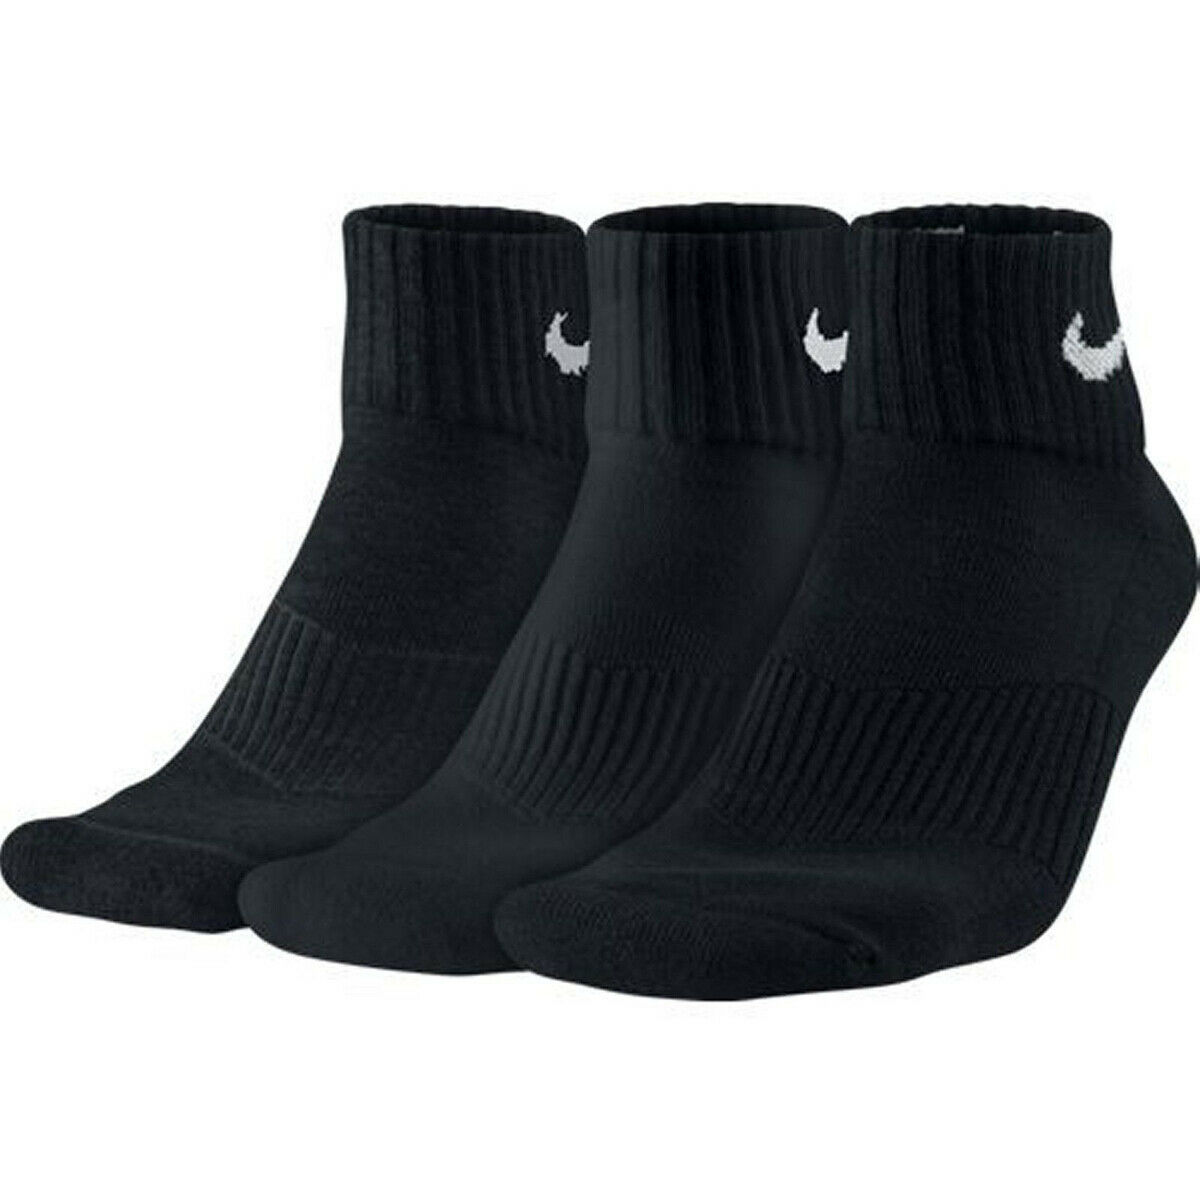 NIKE Herren Damen CUSHION QUARTER Sport Freizeit Socken Strümpfe 3er Pack SX7667